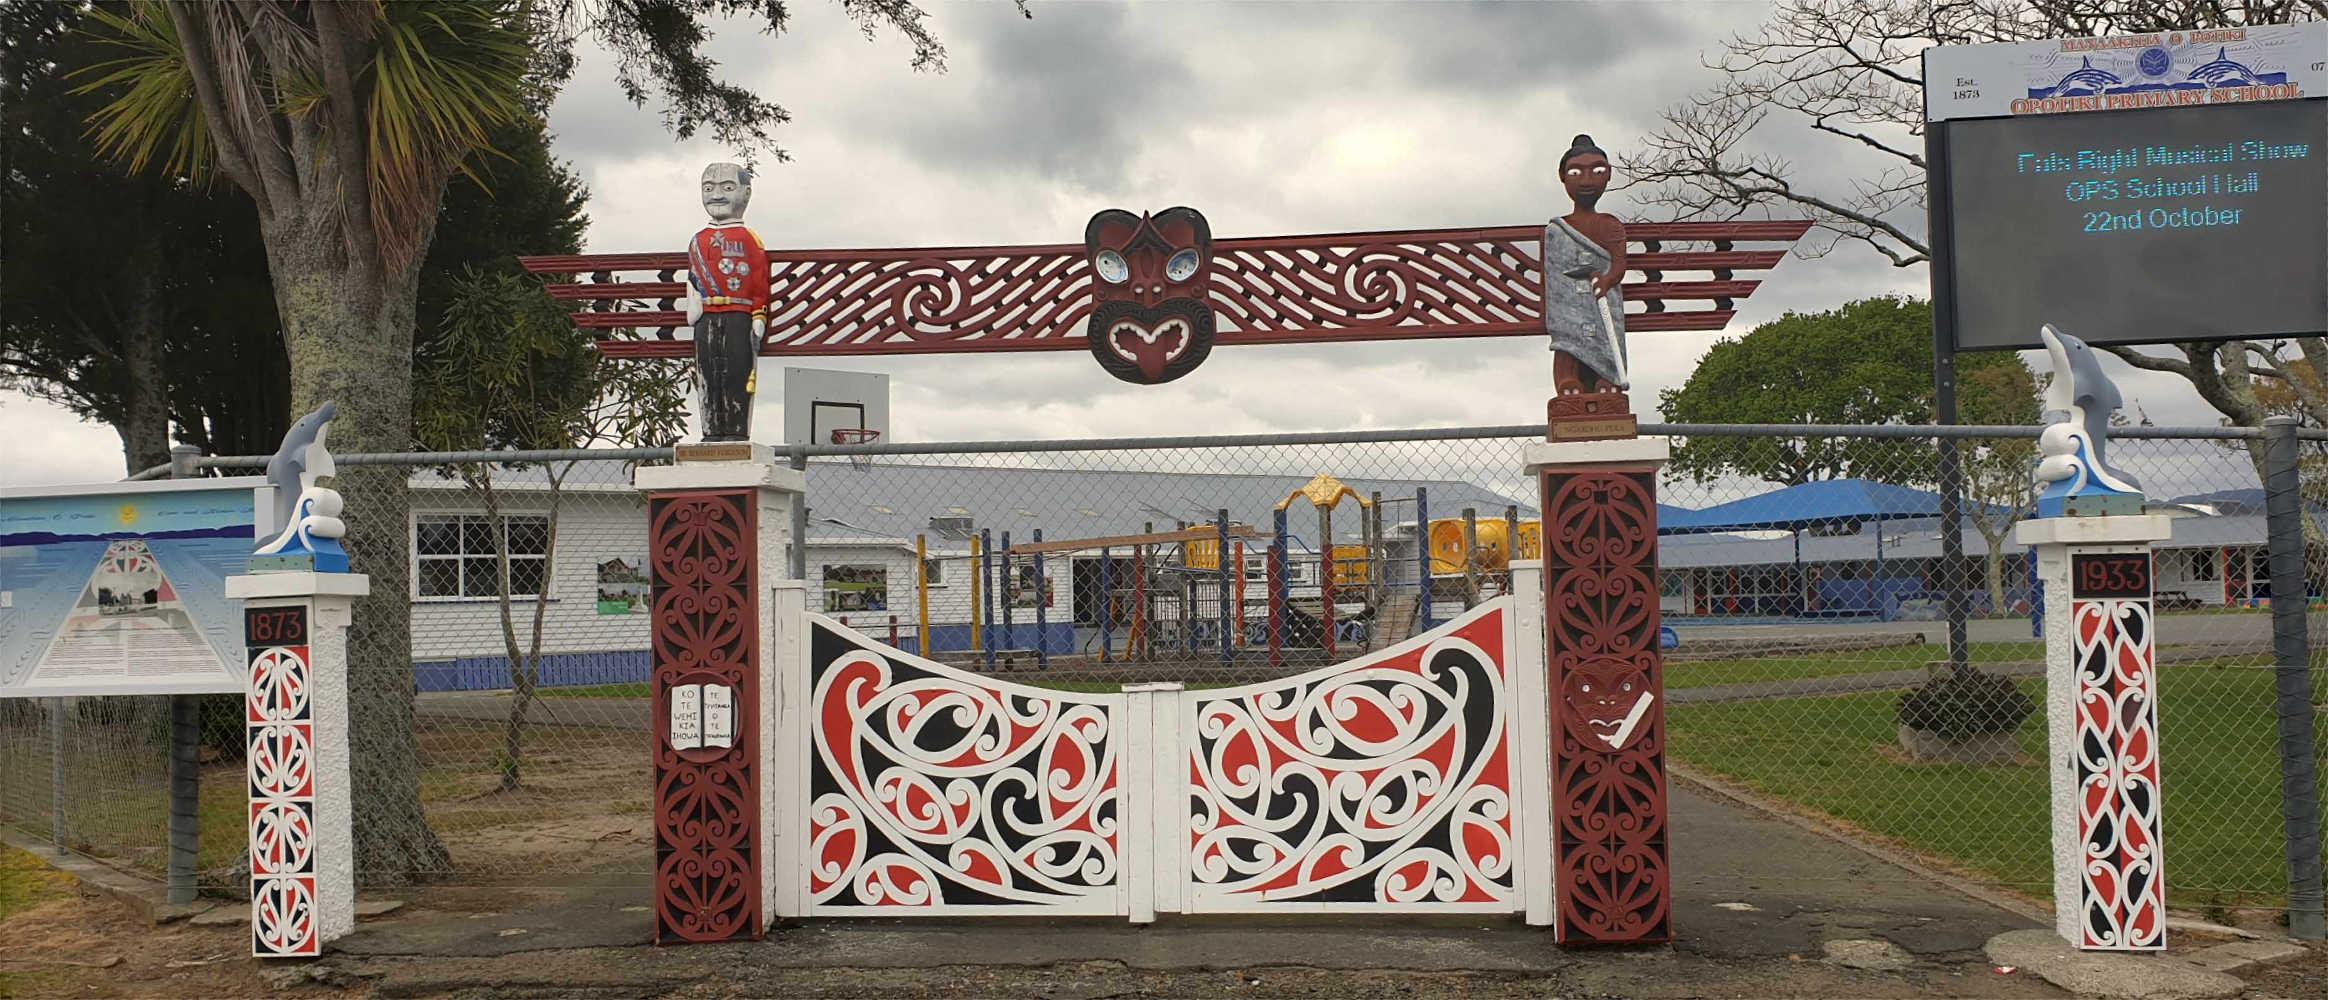 Opotiki Primary School entrance is a striking example of Maori interpretation,New Zealand